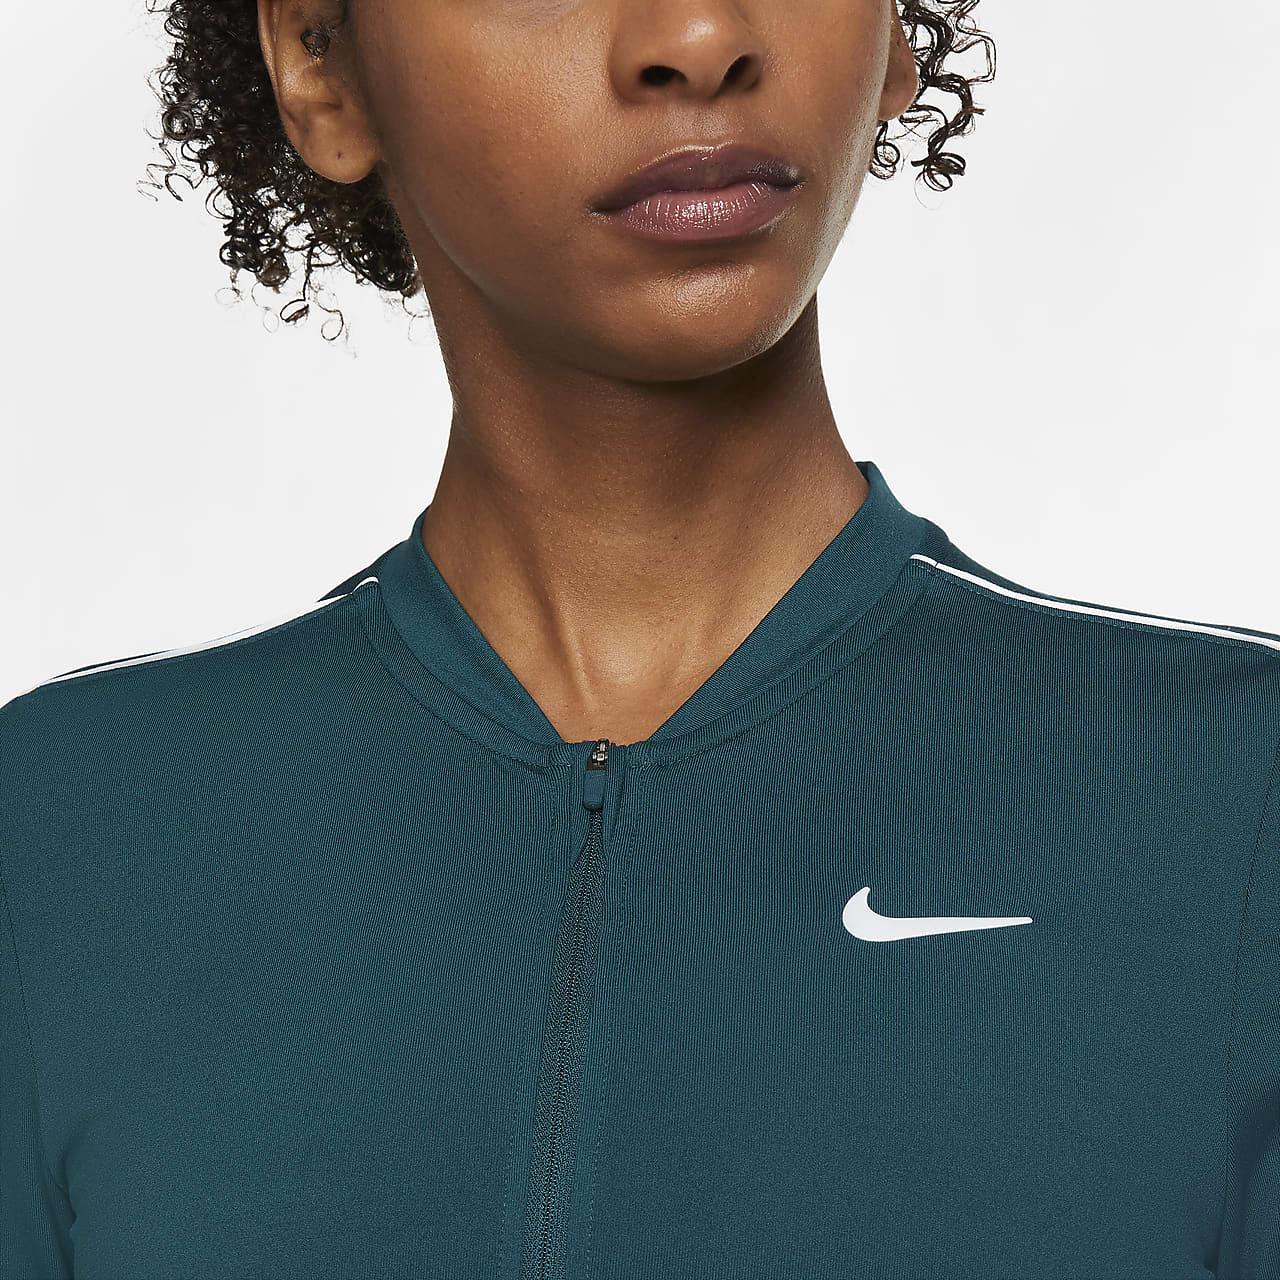 NikeCourt Dri-FIT Women's 1/2-Zip Long-Sleeve Tennis Top 939322-300